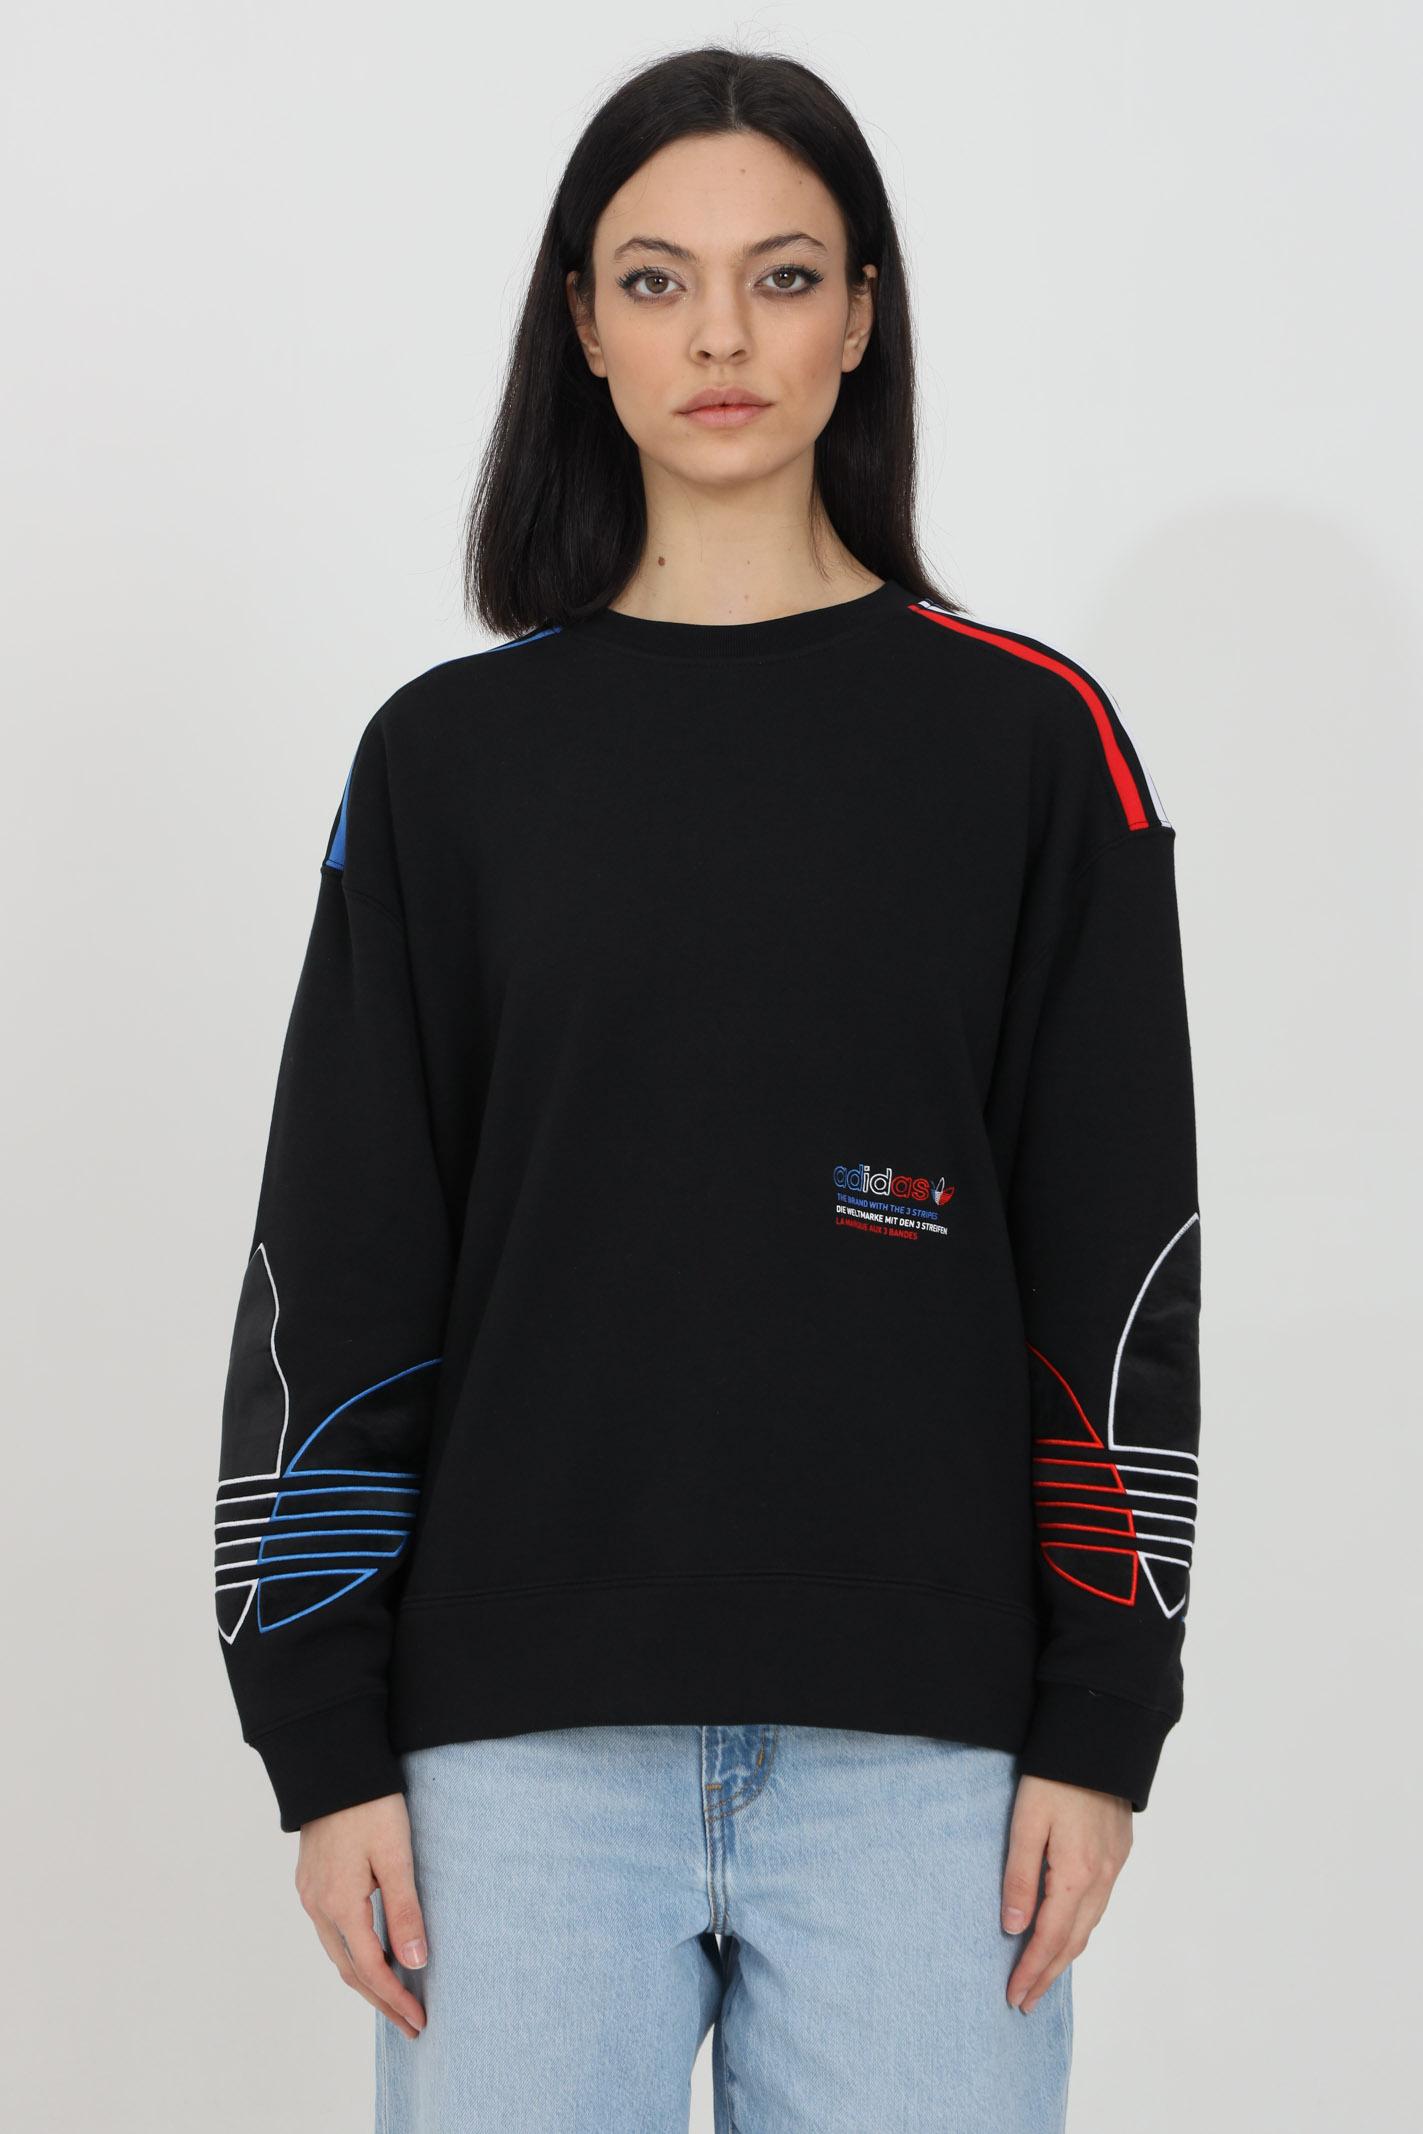 Crew neck sweatshirt with multicolor embroidery ADIDAS | Sweatshirt | GN2822.